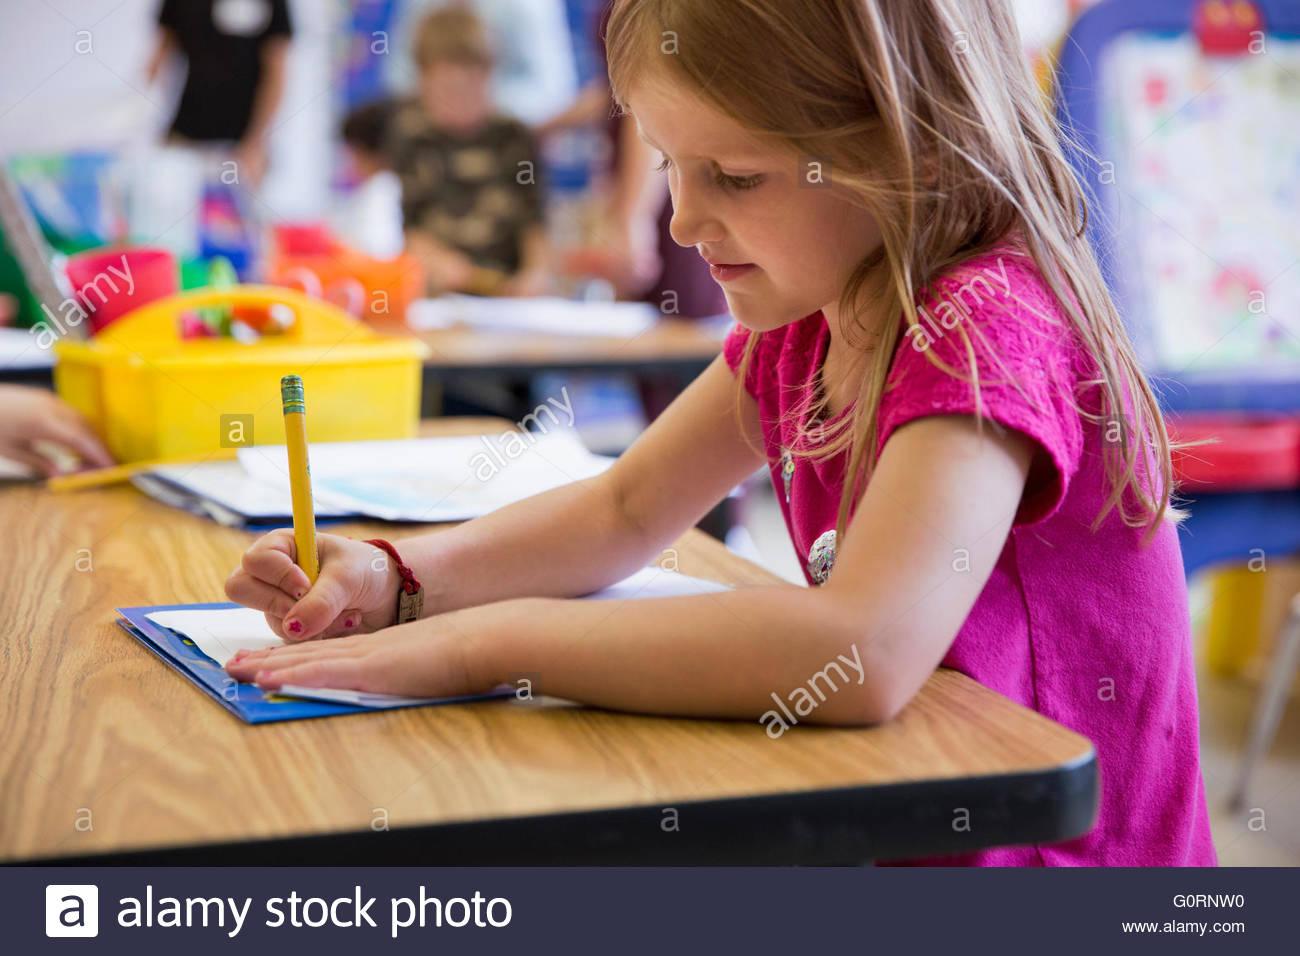 young girl in schoolroom working on classwork - Stock Image